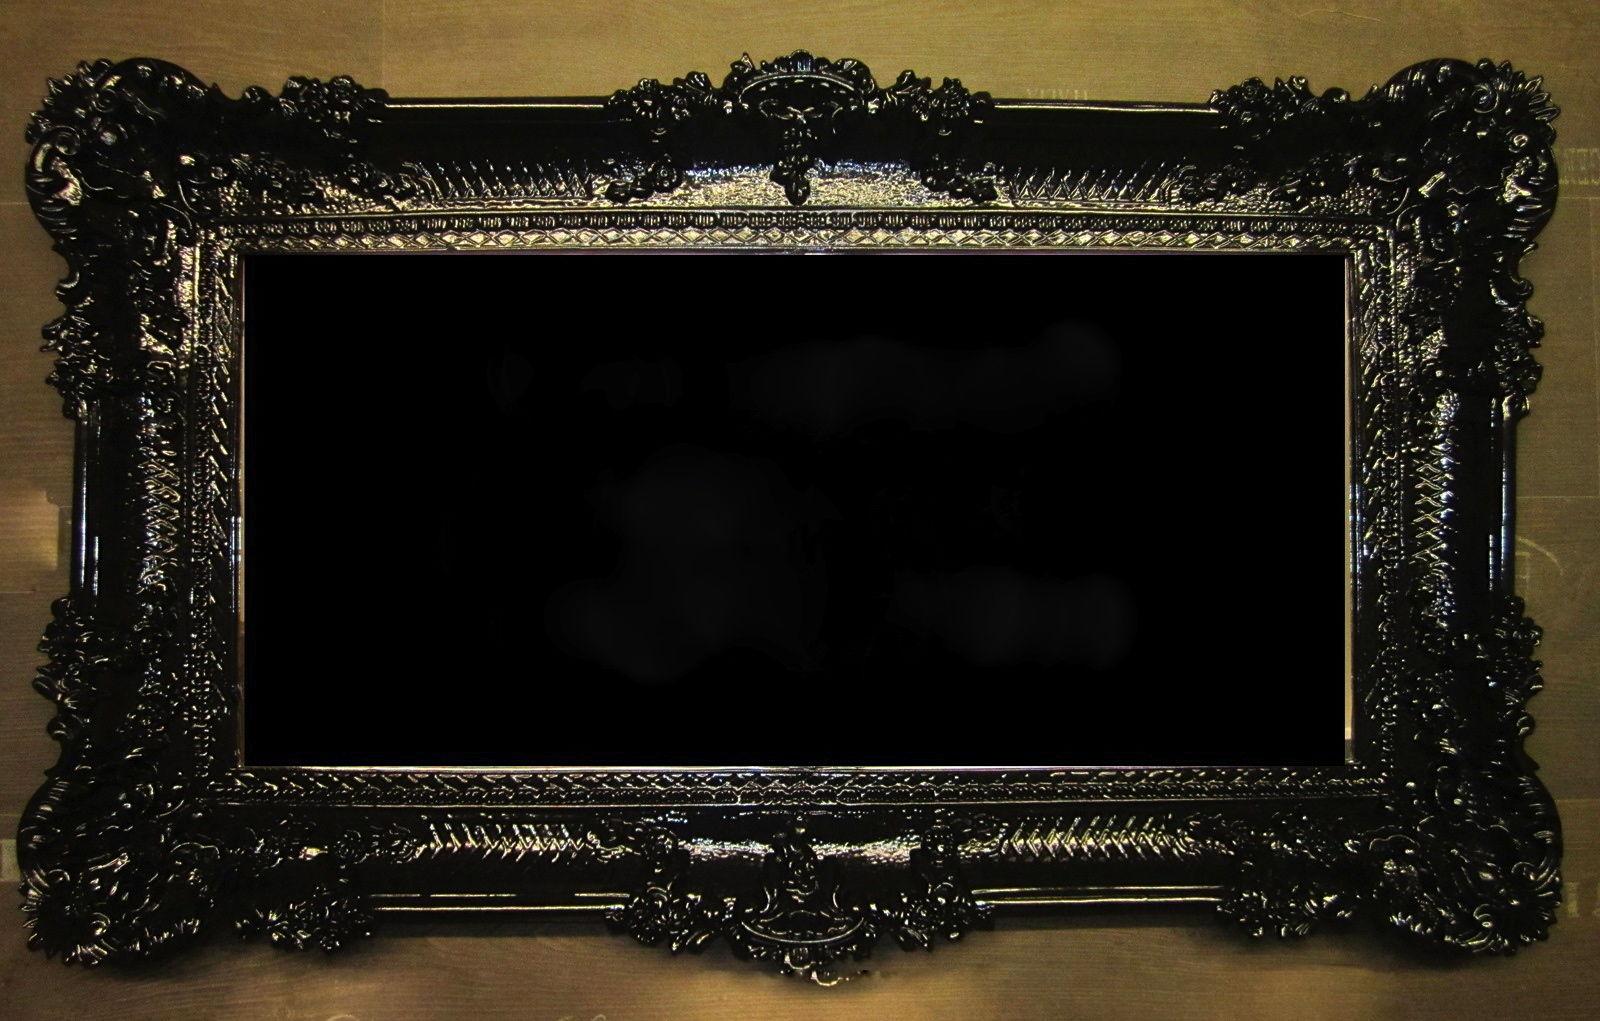 bilderrahmen xxl xxl bilderrahmen ausgezeichnet. Black Bedroom Furniture Sets. Home Design Ideas